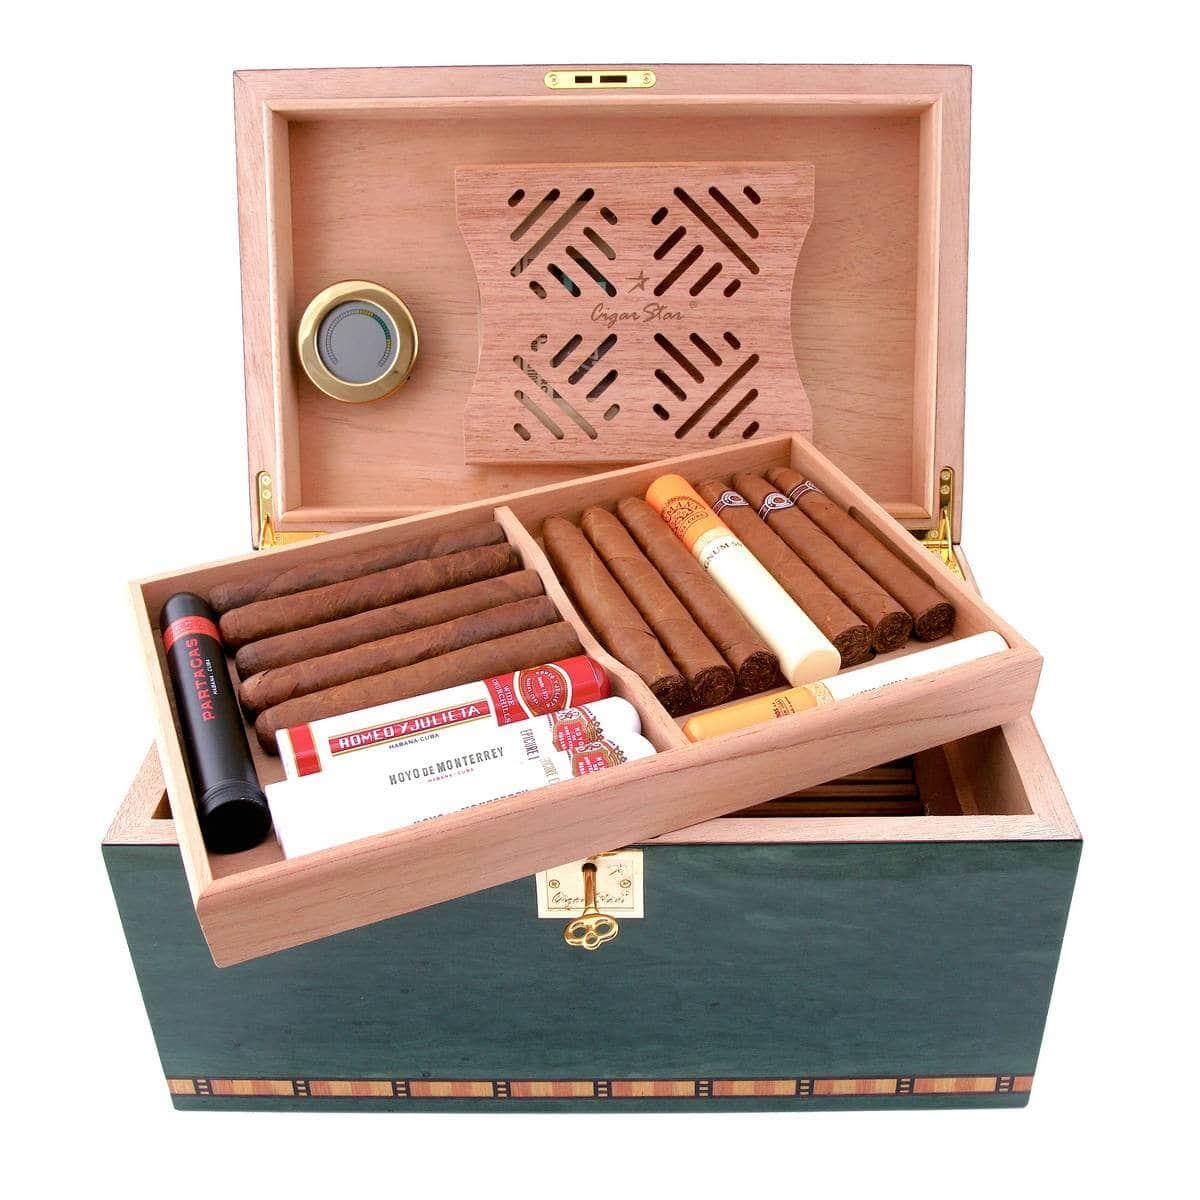 Boveda inside your cigar humidor.